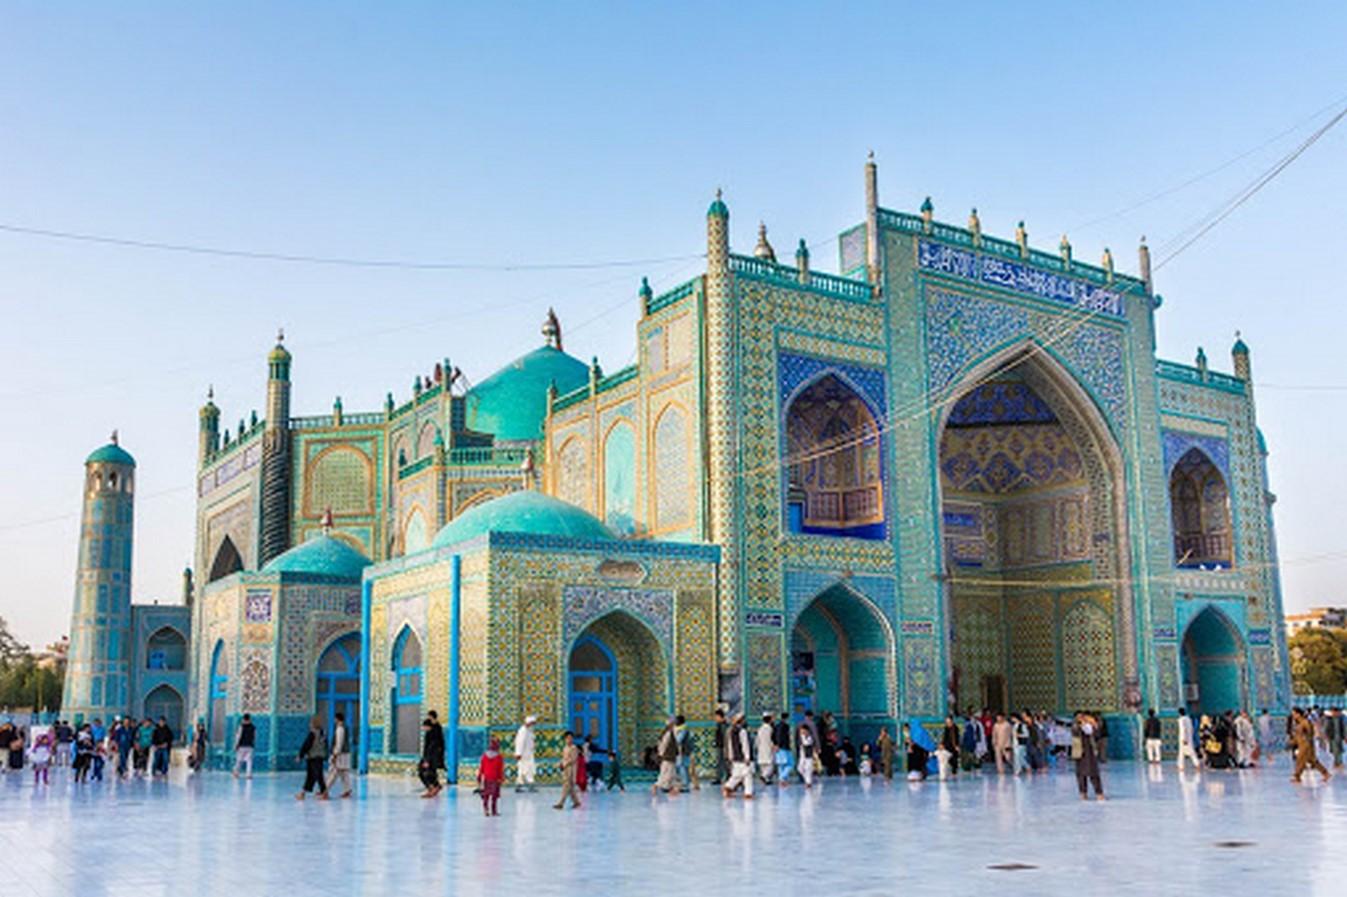 Blue Mosque (Shrine of Hazrat Ali) /Rawza-i-Sharif - Sheet3